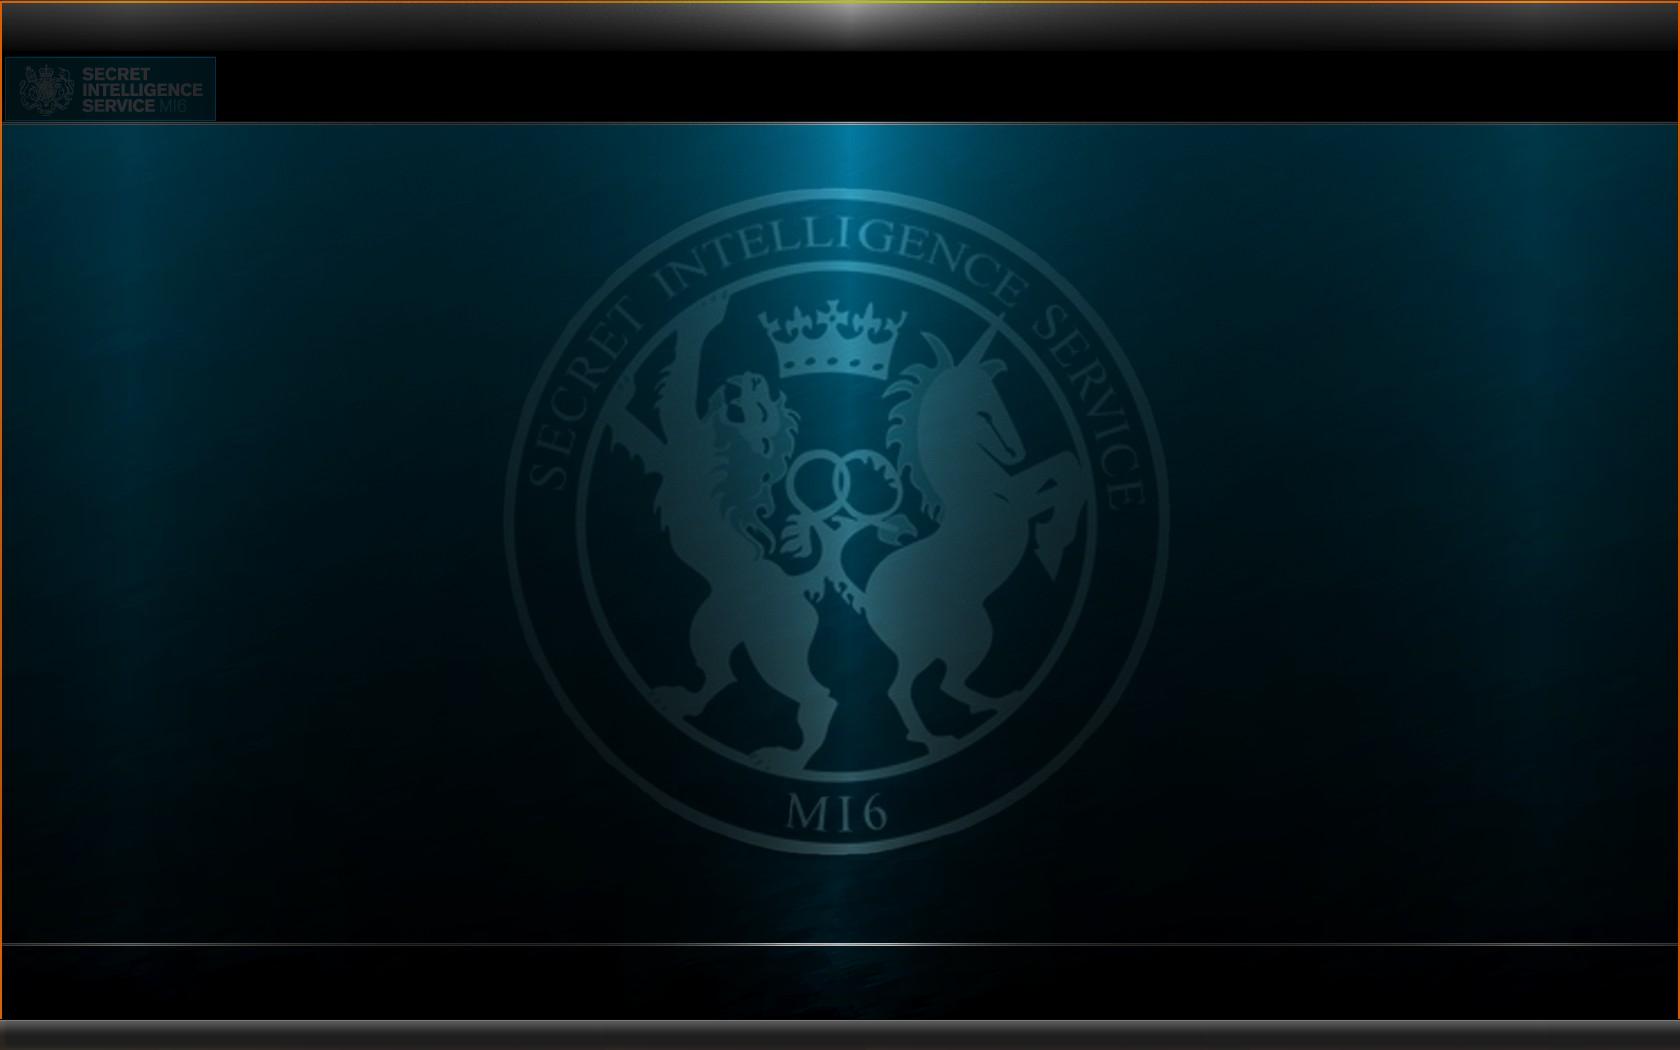 Download Intelligence Service Wallpaper 1680x1050 Wallpoper 425765 1680x1050